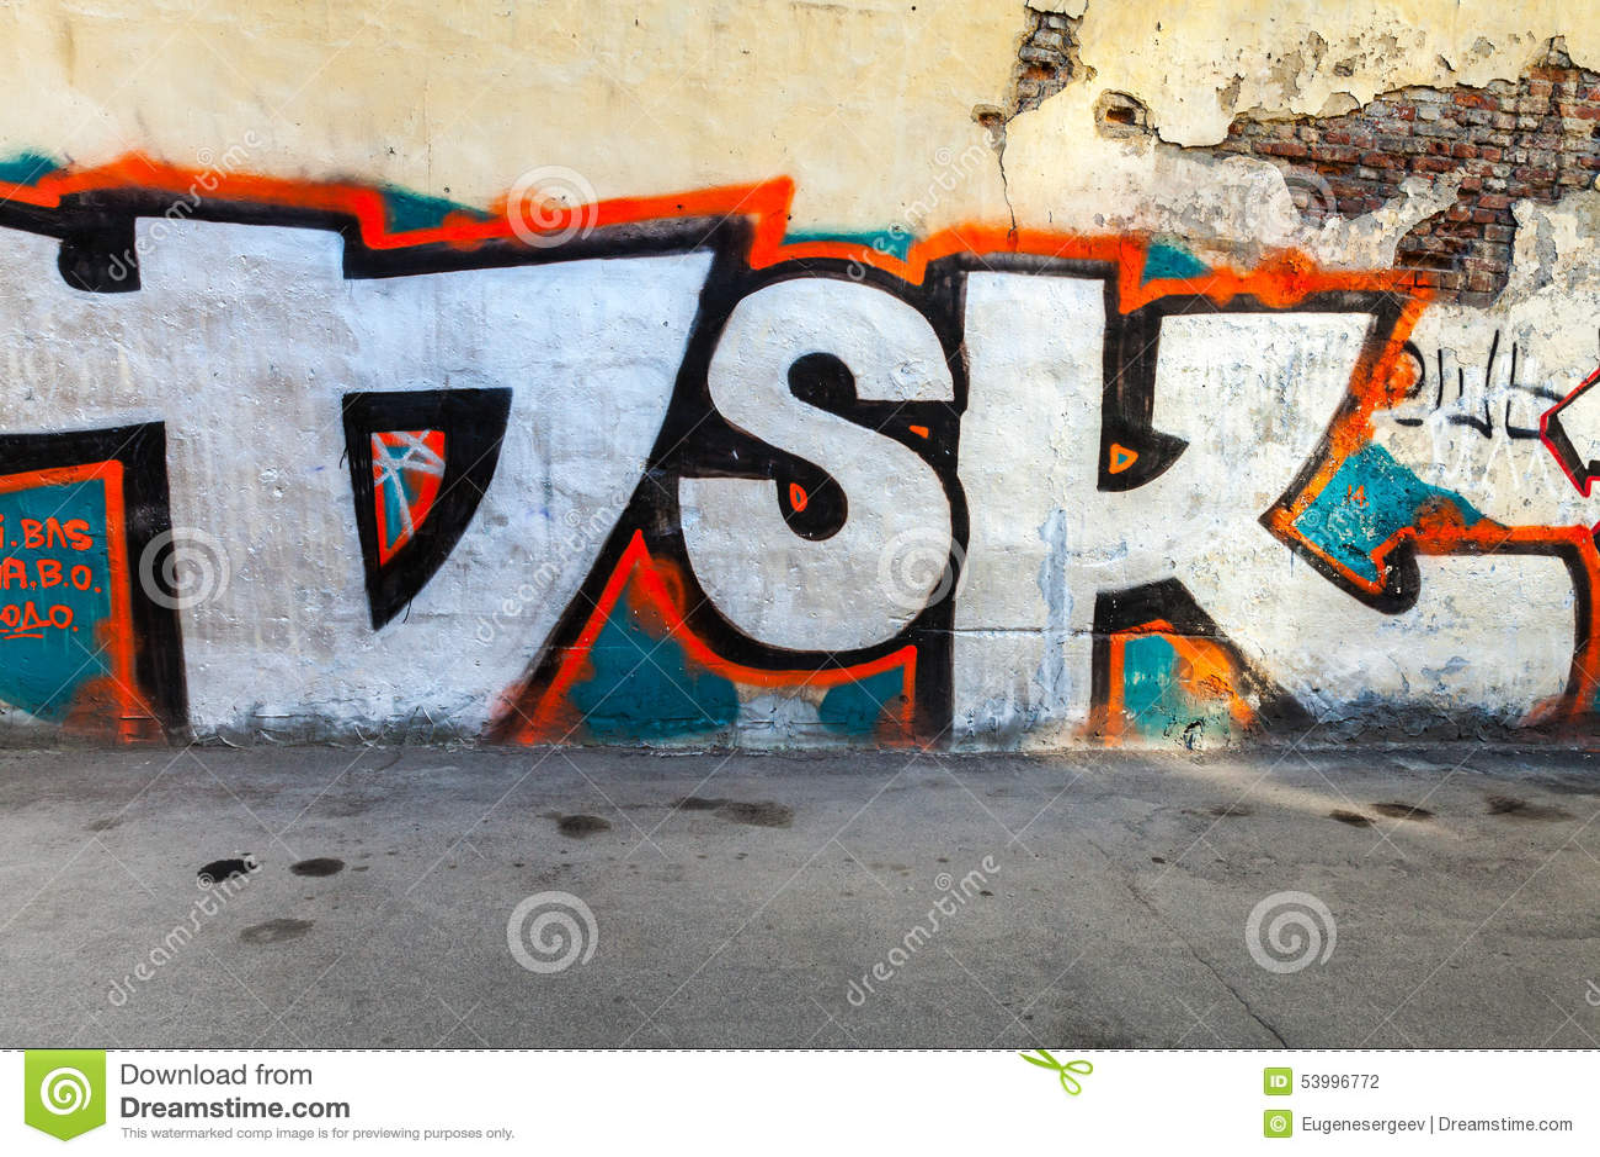 Graffiti wall writing - Abstract Graffiti Letters On Old Damaged Wall